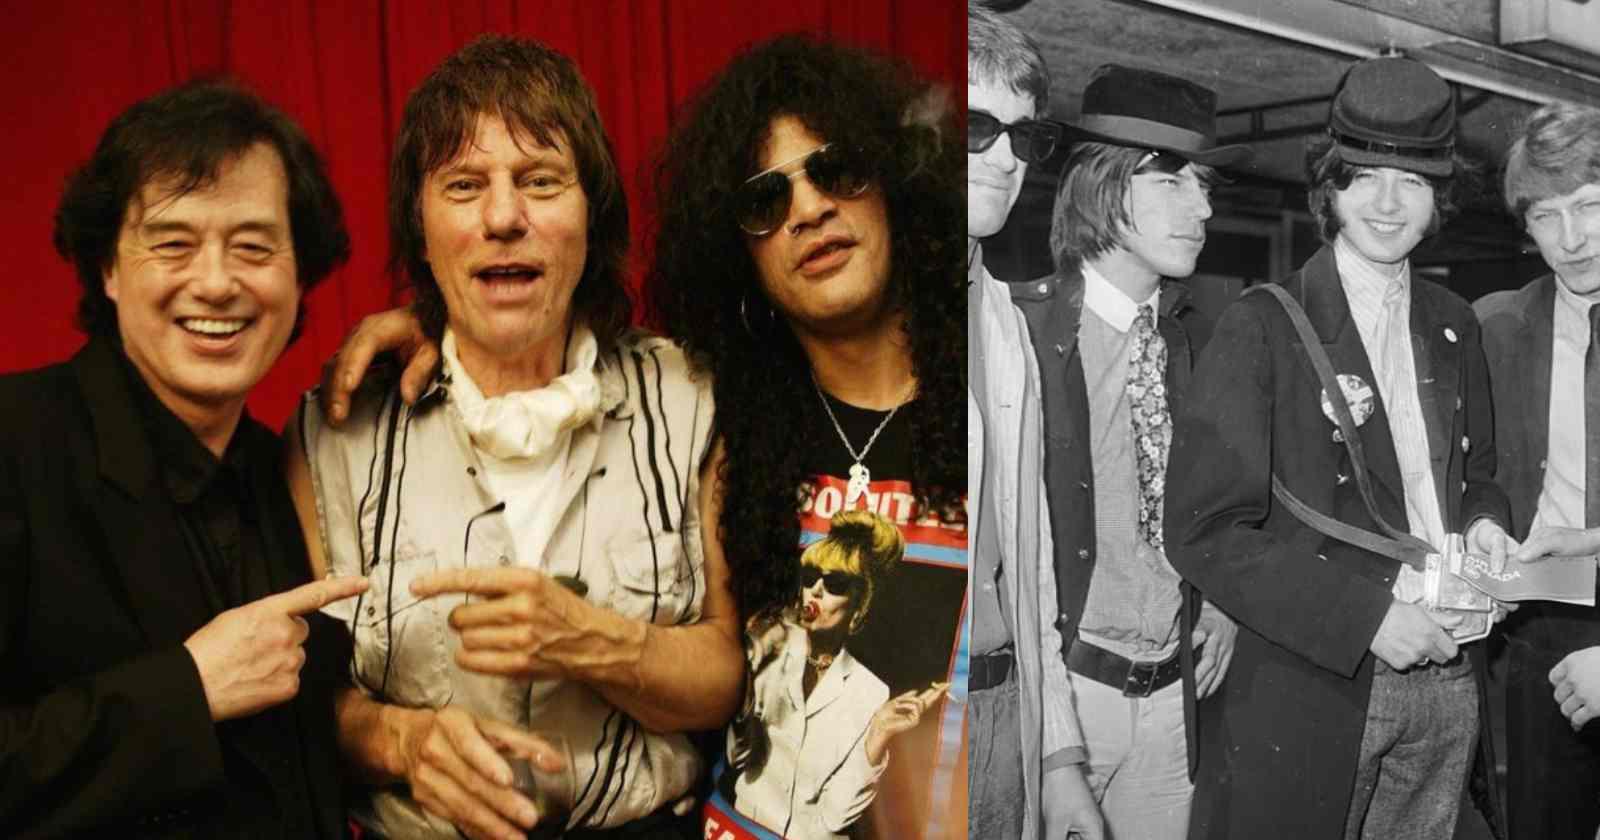 Jeff Beck Jimmy Page